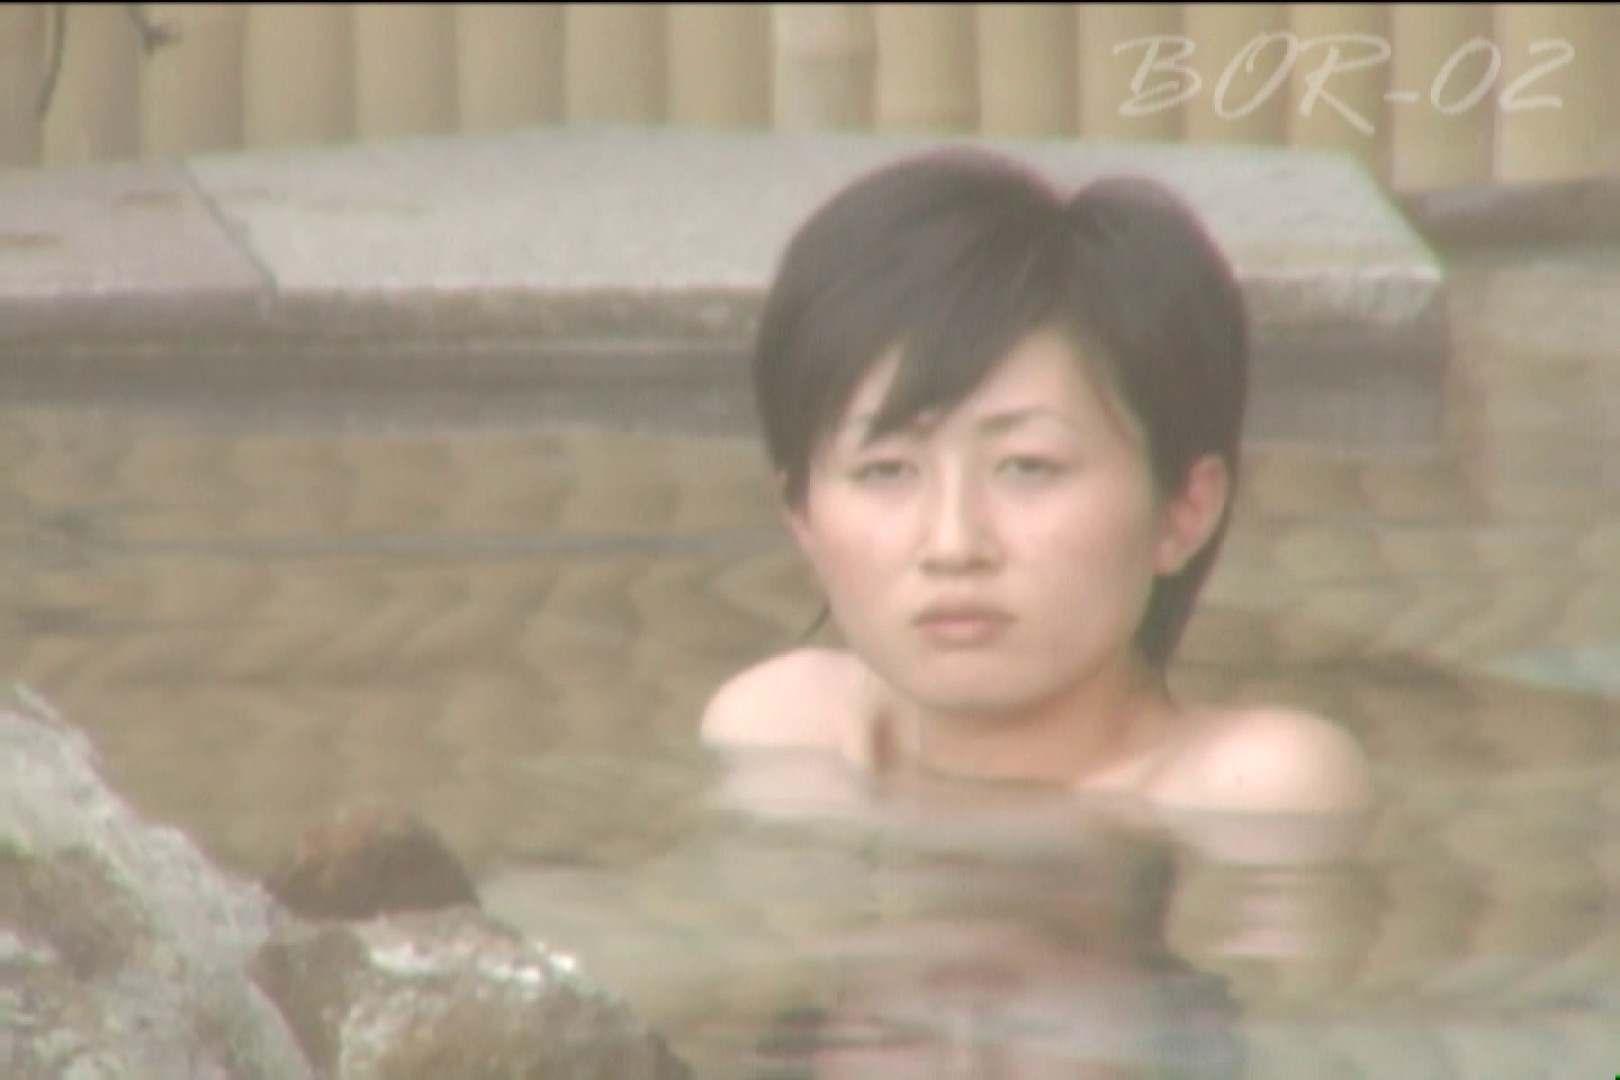 Aquaな露天風呂Vol.480 盗撮シリーズ | 露天風呂編  102PIX 5